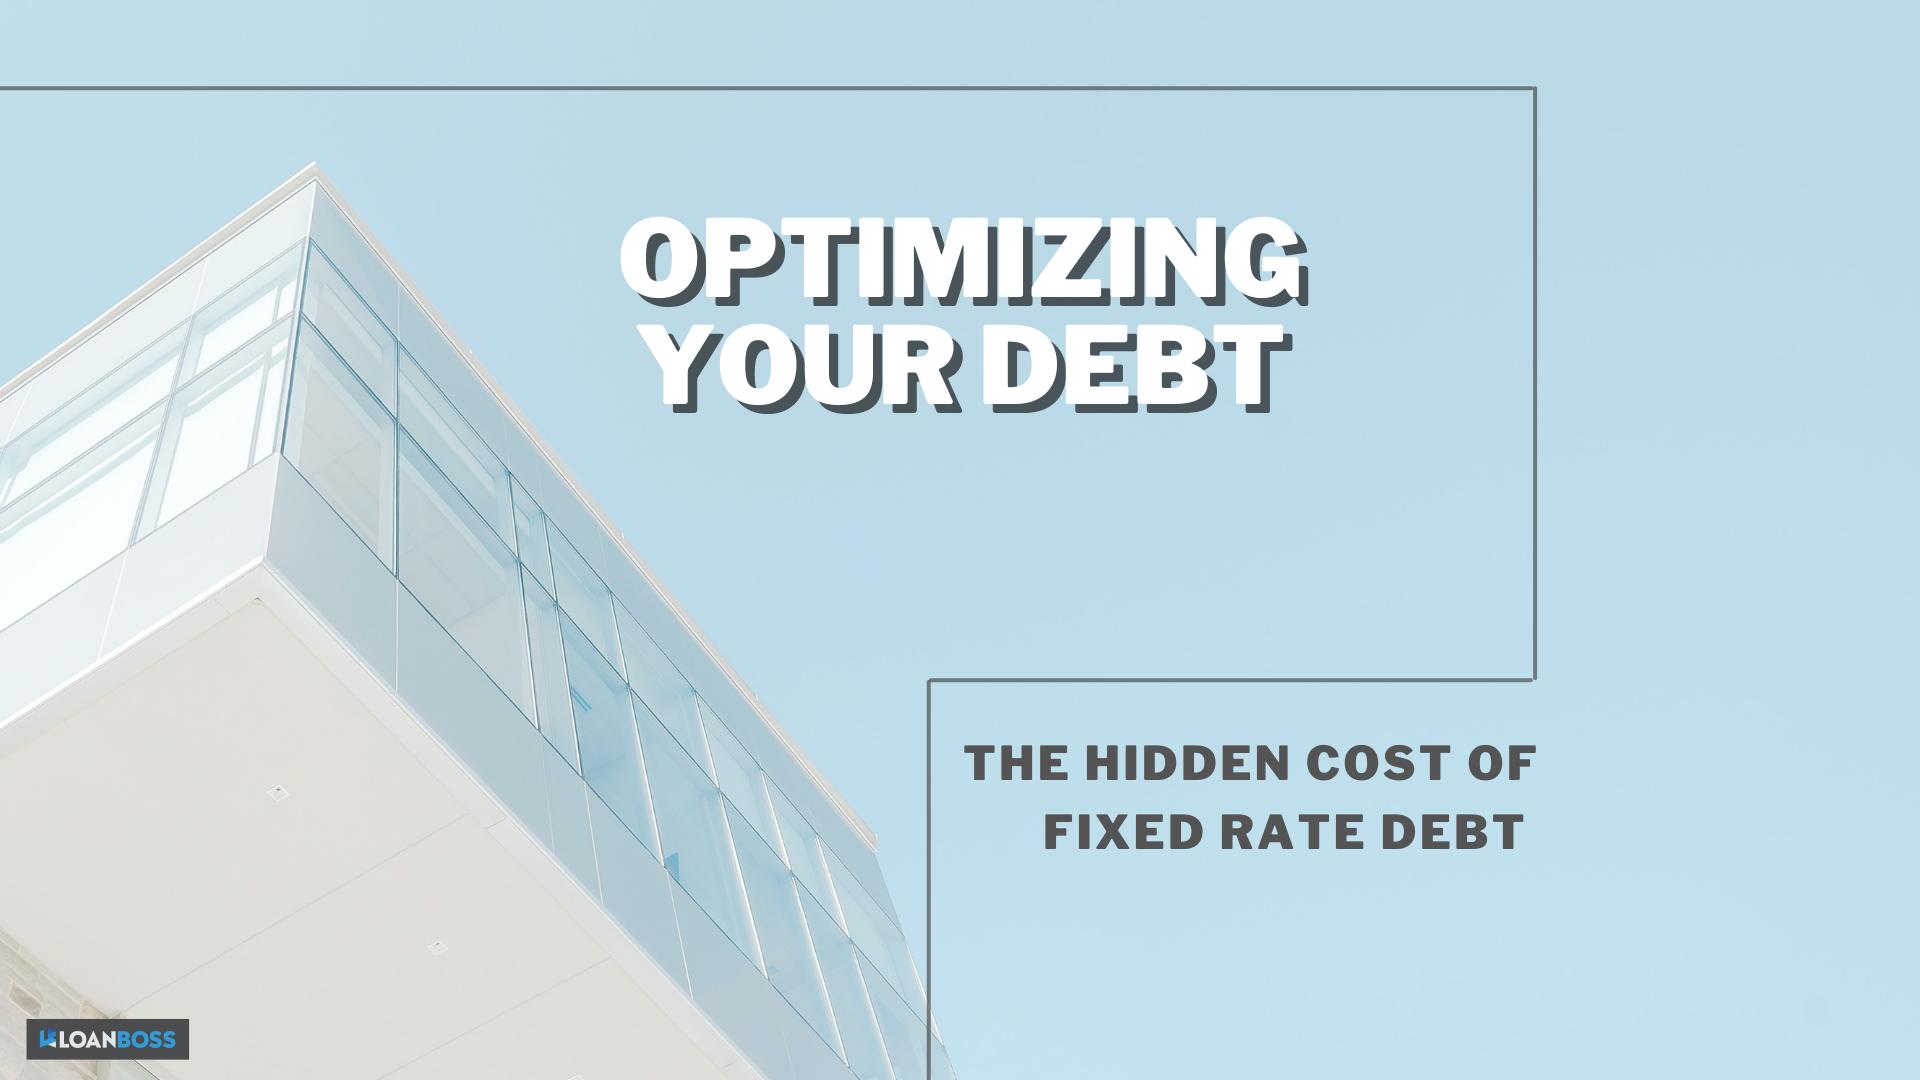 Optimizing Your Debt - The Hidden Cost of Fixed Rate Debt (1)